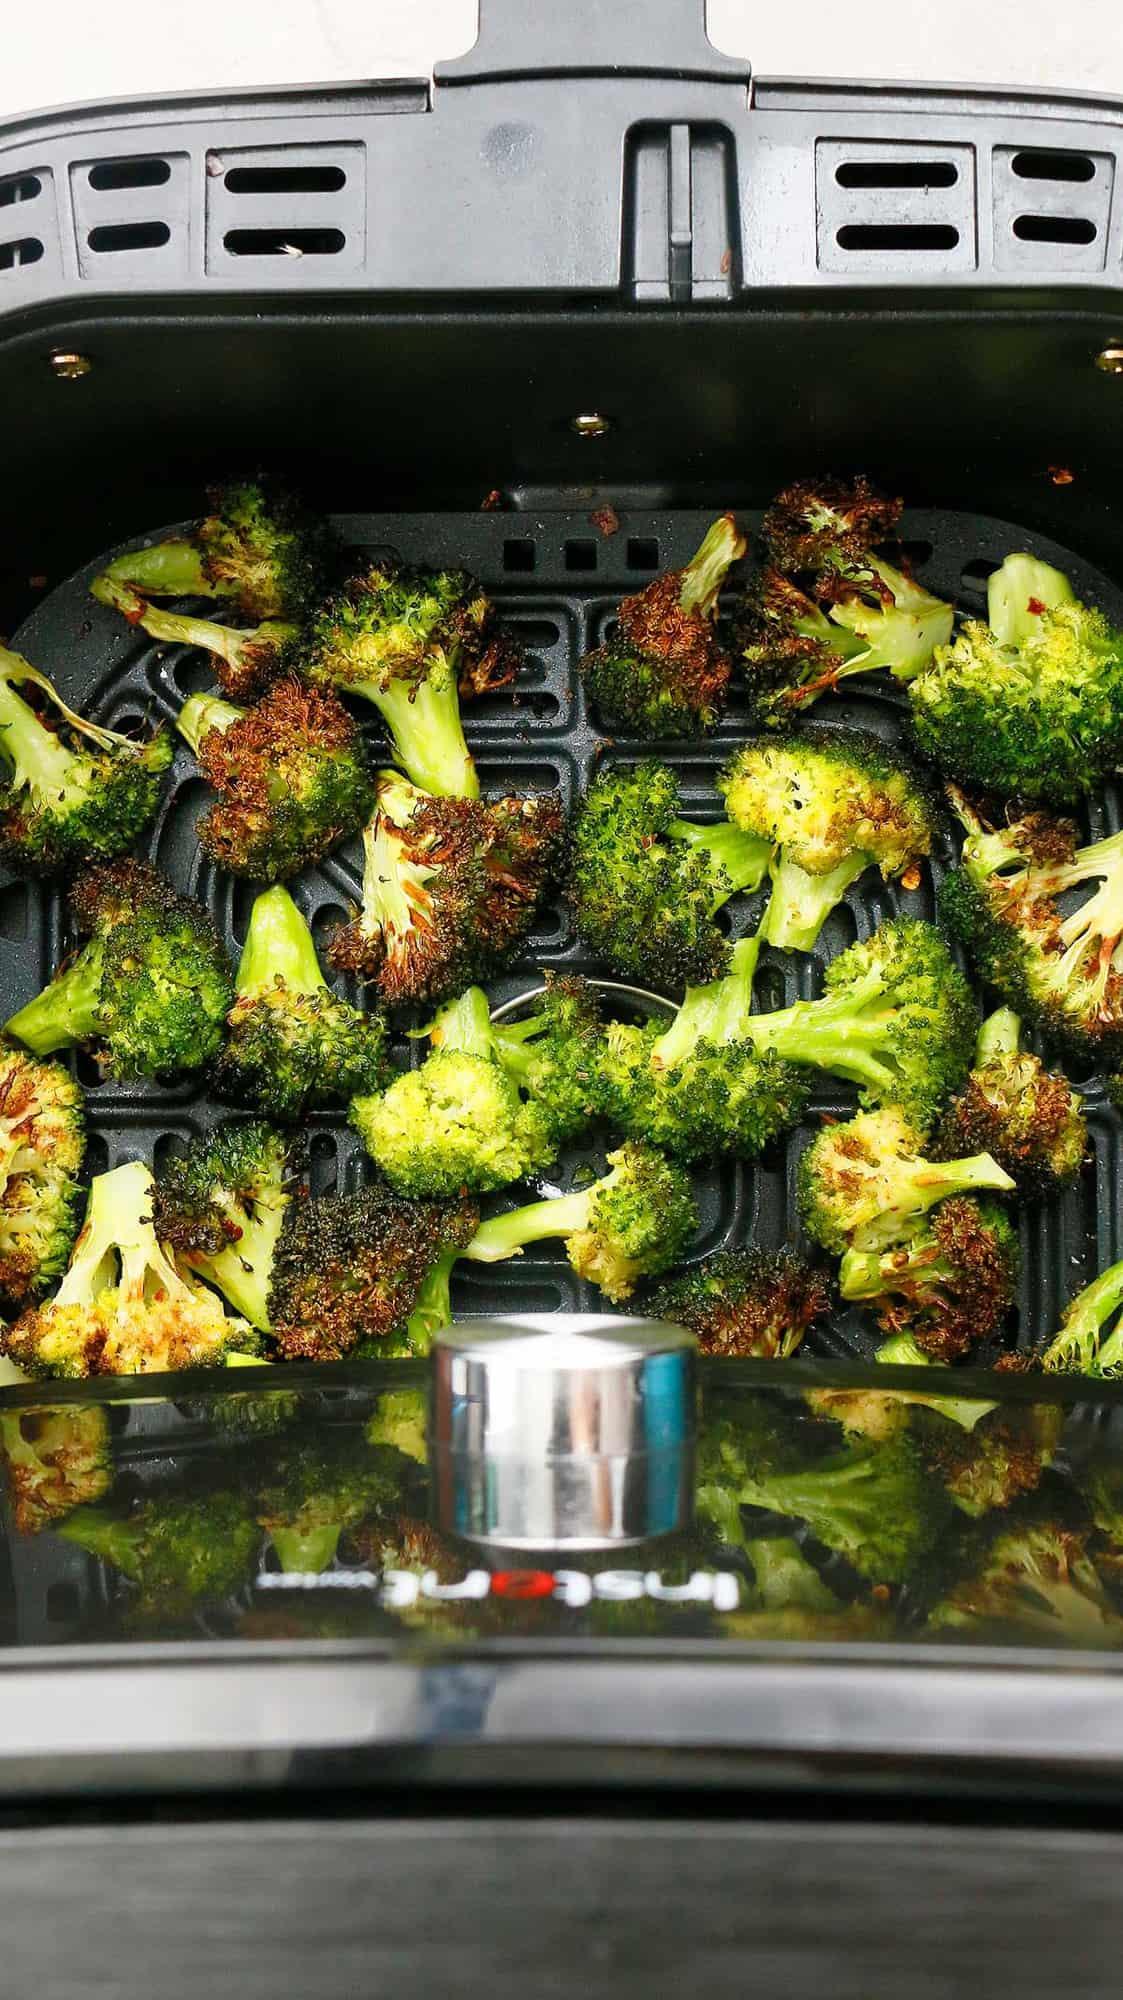 roasted crispy broccoli in an air fryer